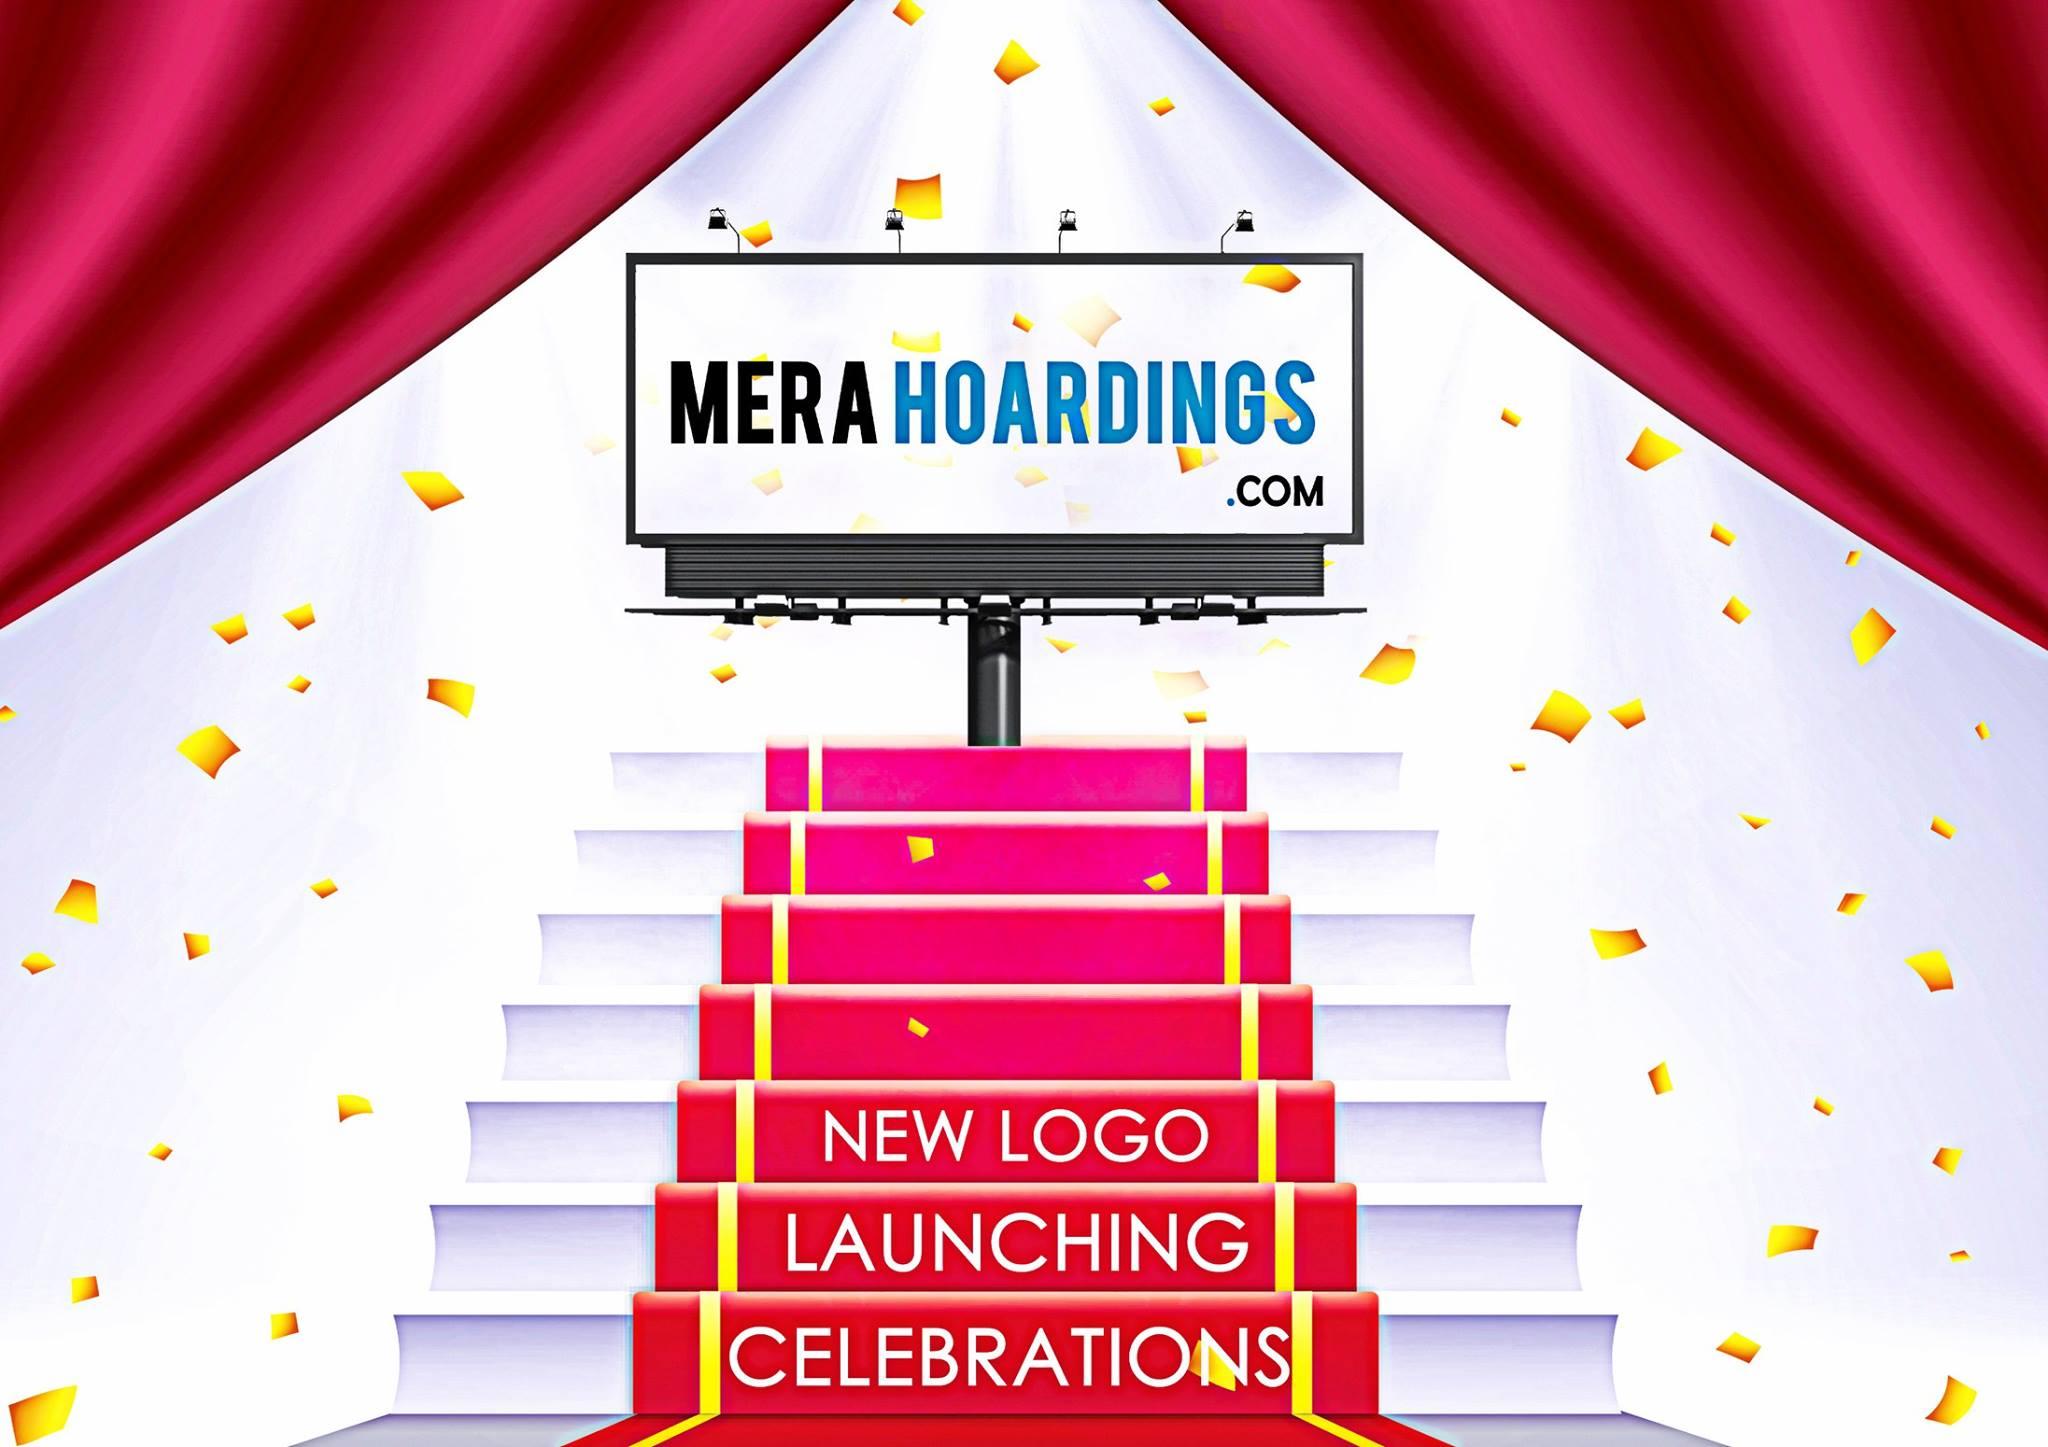 outdoor media, billboard online, Hoardings Online Booking, billboard advertising online, Hoarding Advertising online booking, Outdoor Advertising online booking, Out-of-home advertising online,